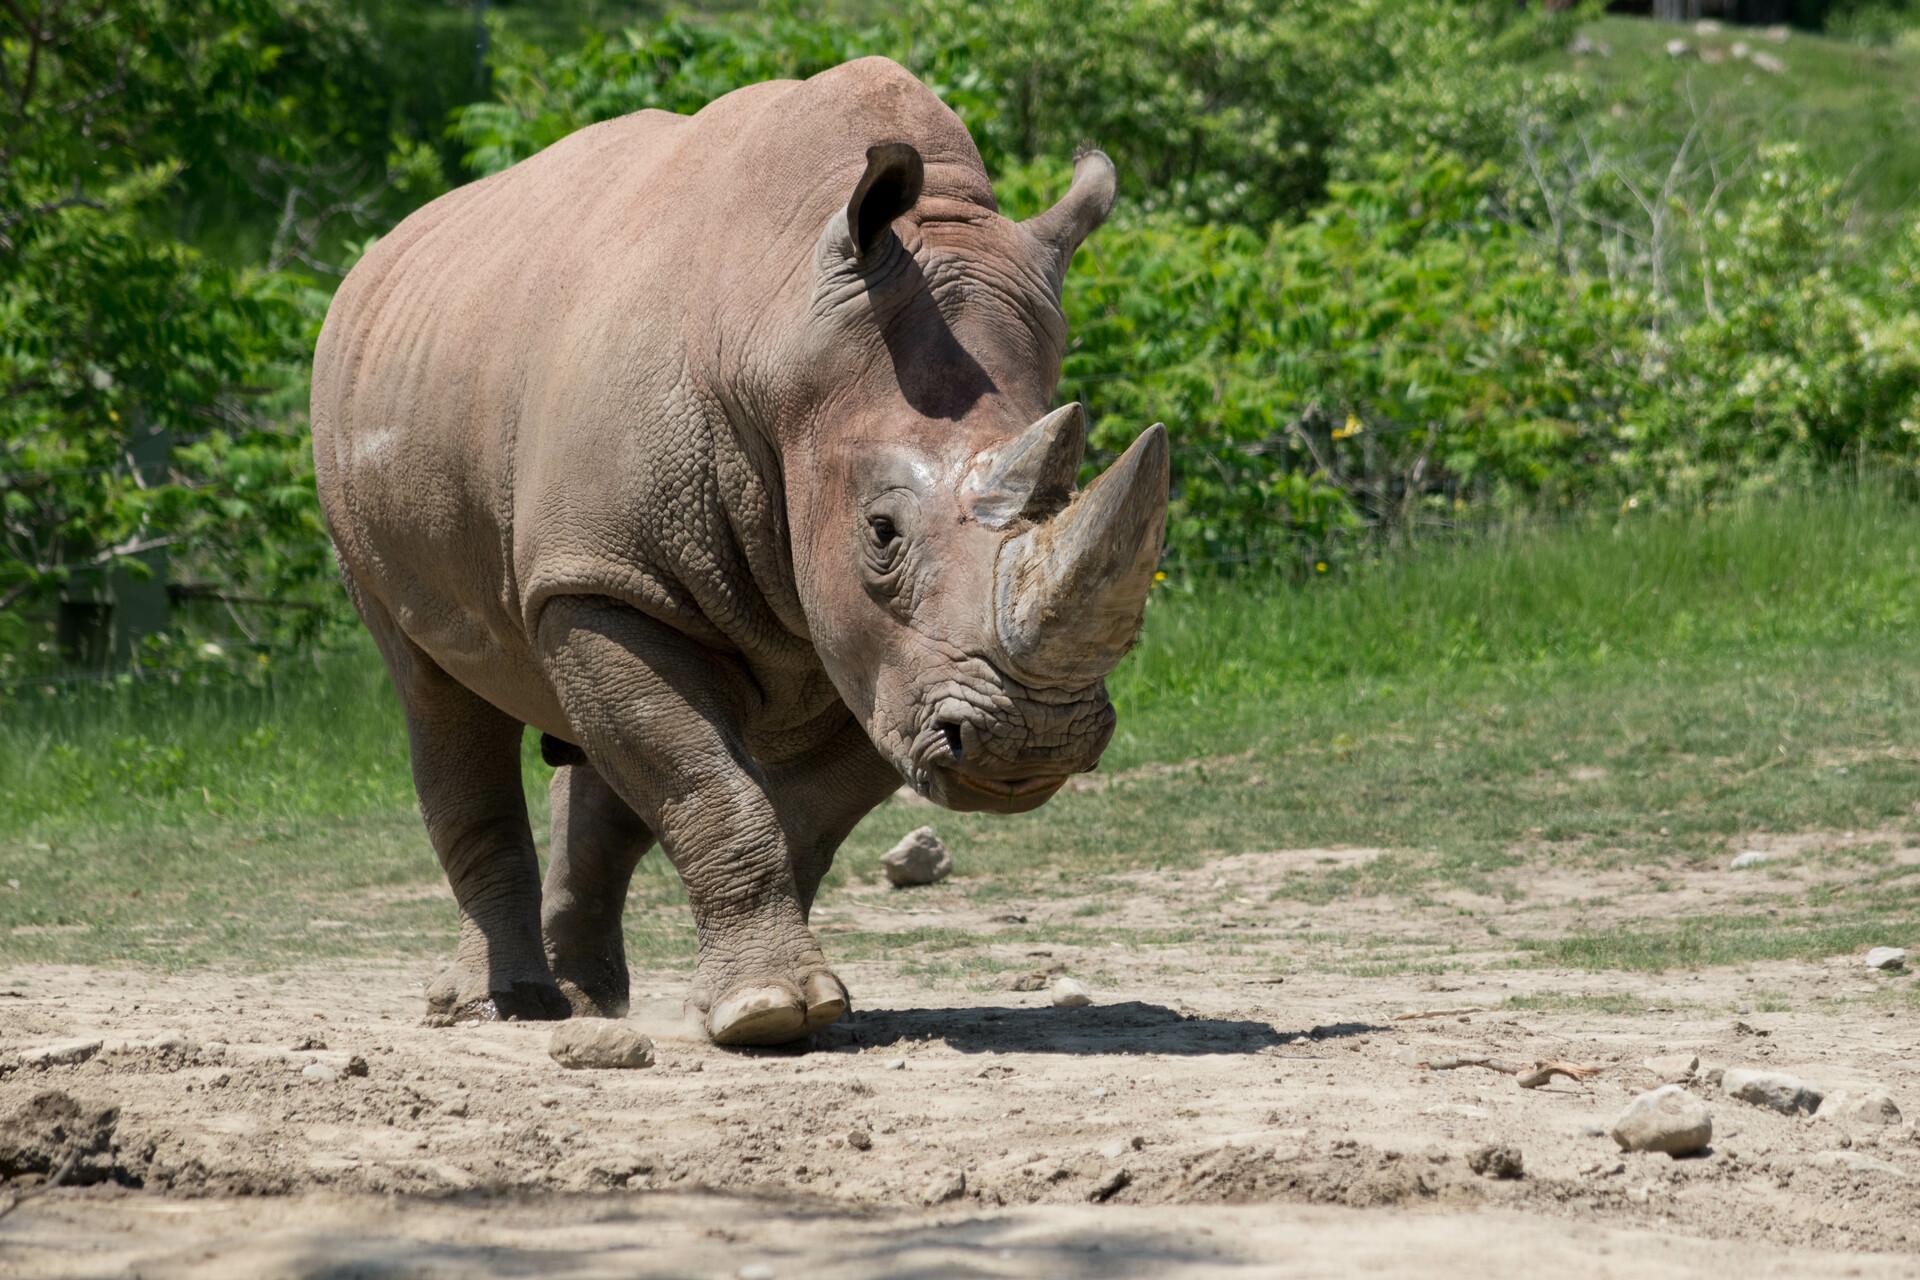 Mustafa kazmi may 30th 2018 toronto zoo 207